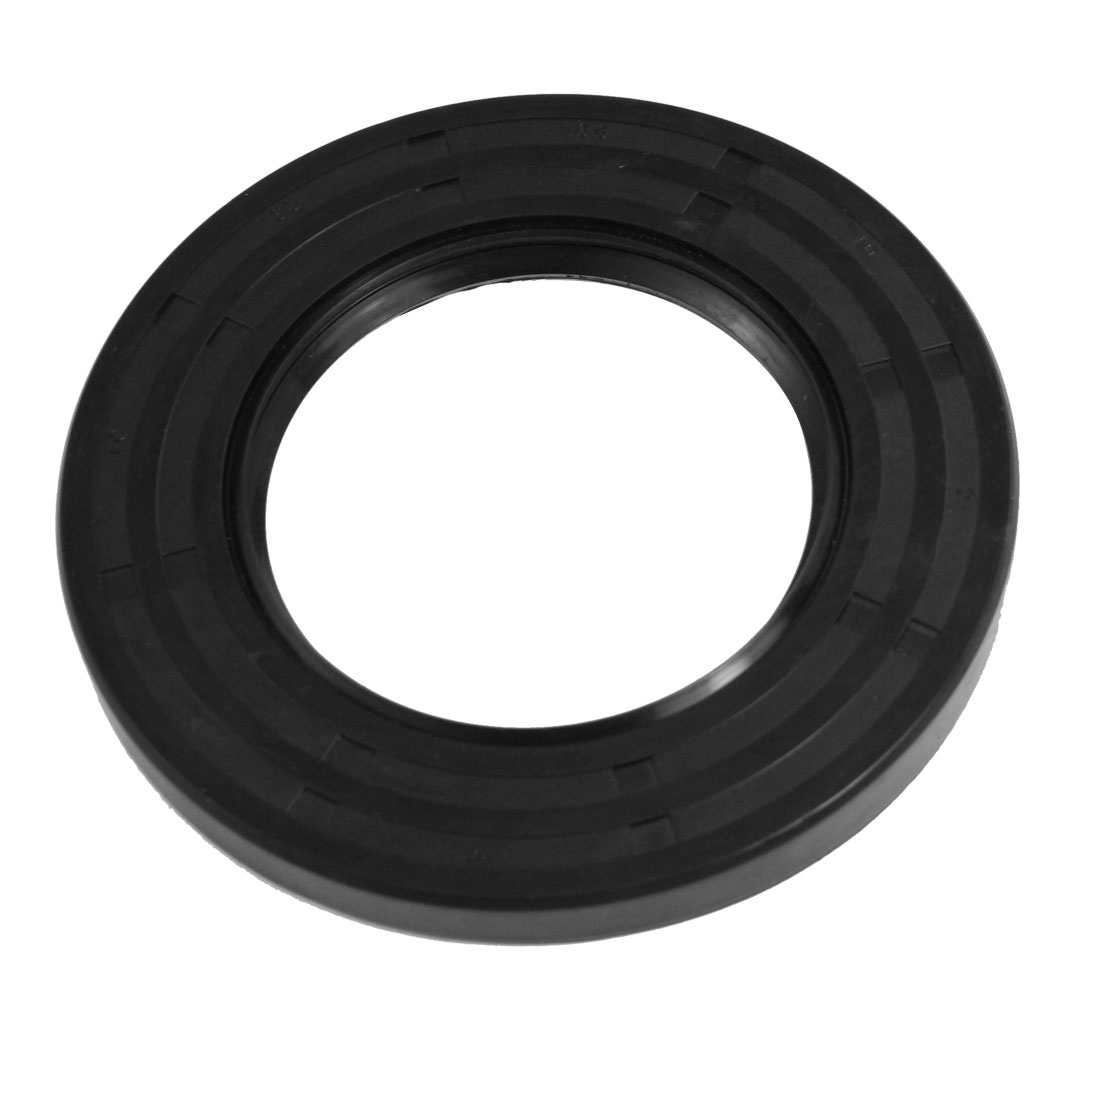 60mm x 100mm x 10mm Black NBR TC Double Lip Rotary Shaft Oil Seal